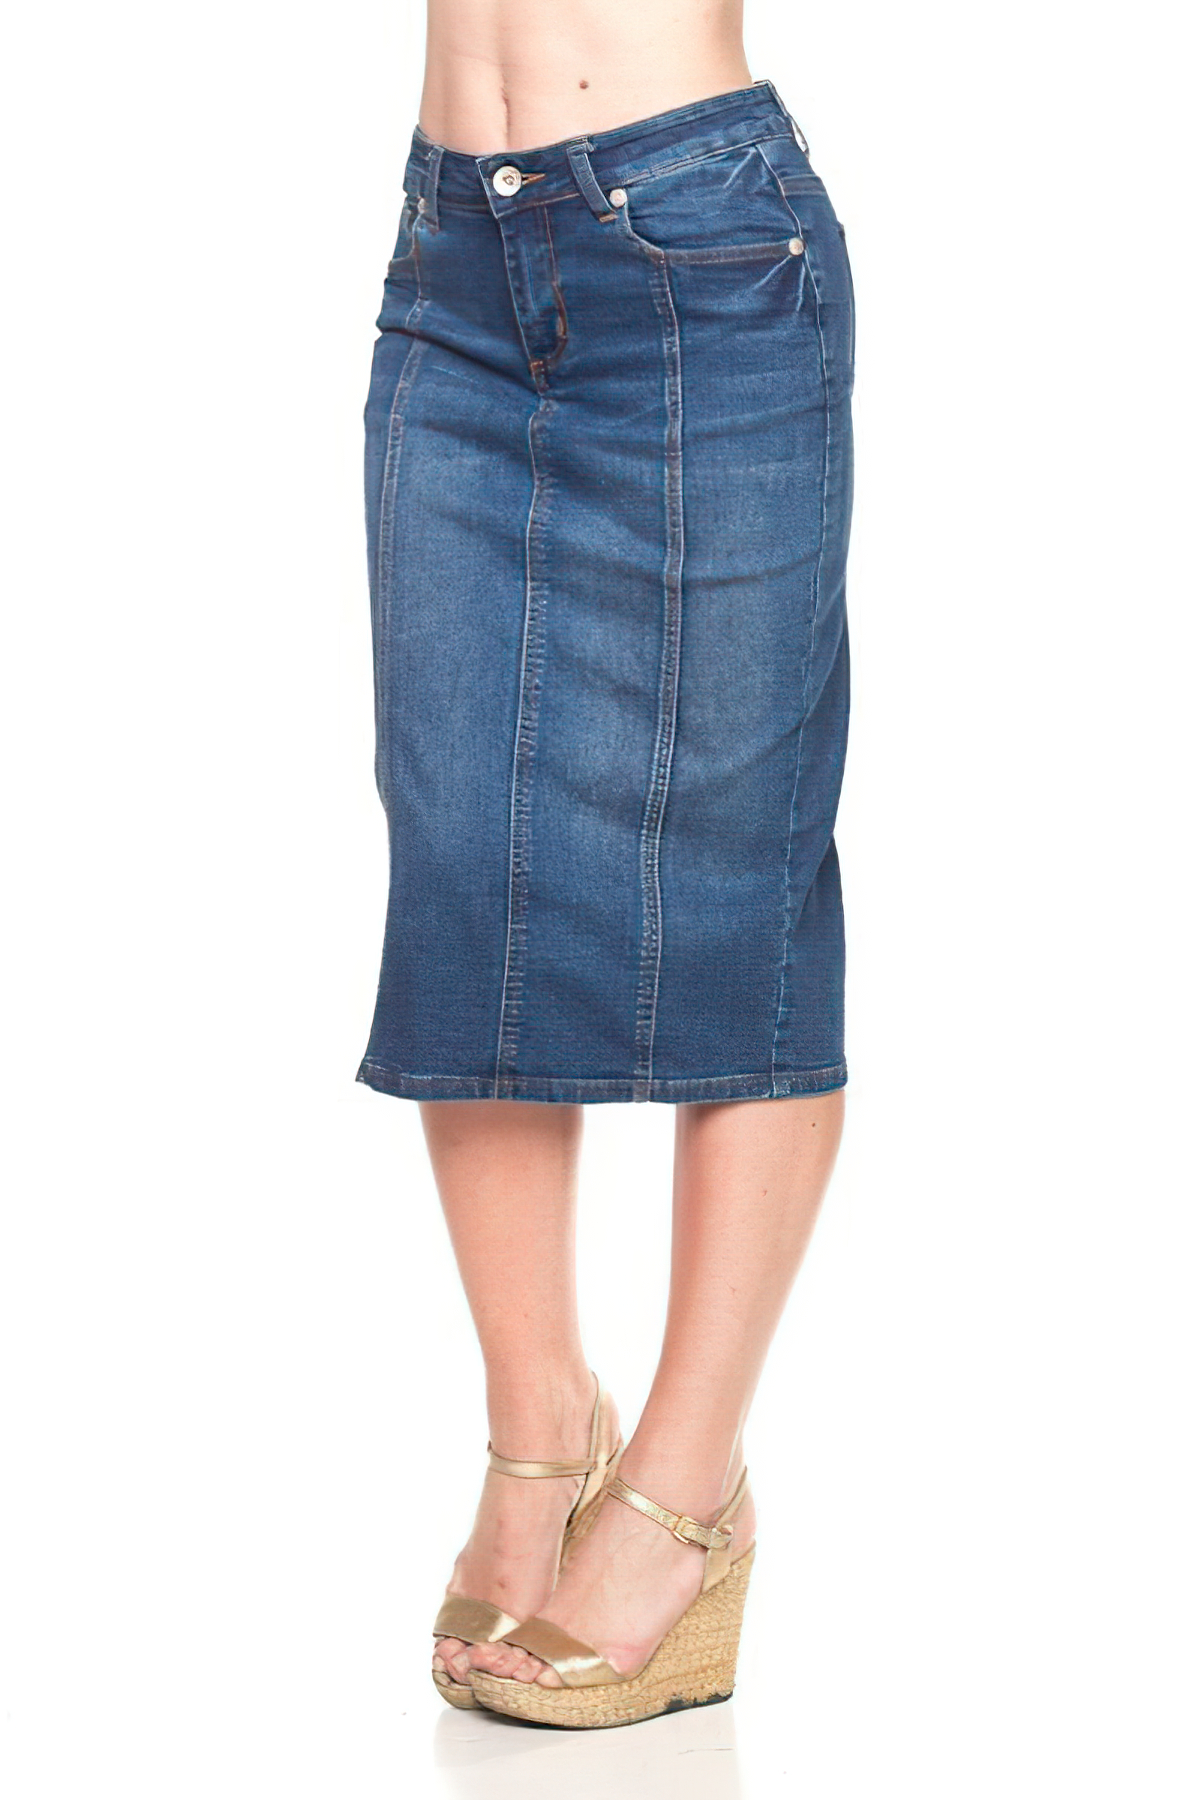 Women/'s Juniors//Plus Size Middle Length Pencil Distressed Stretch Denim Skirt